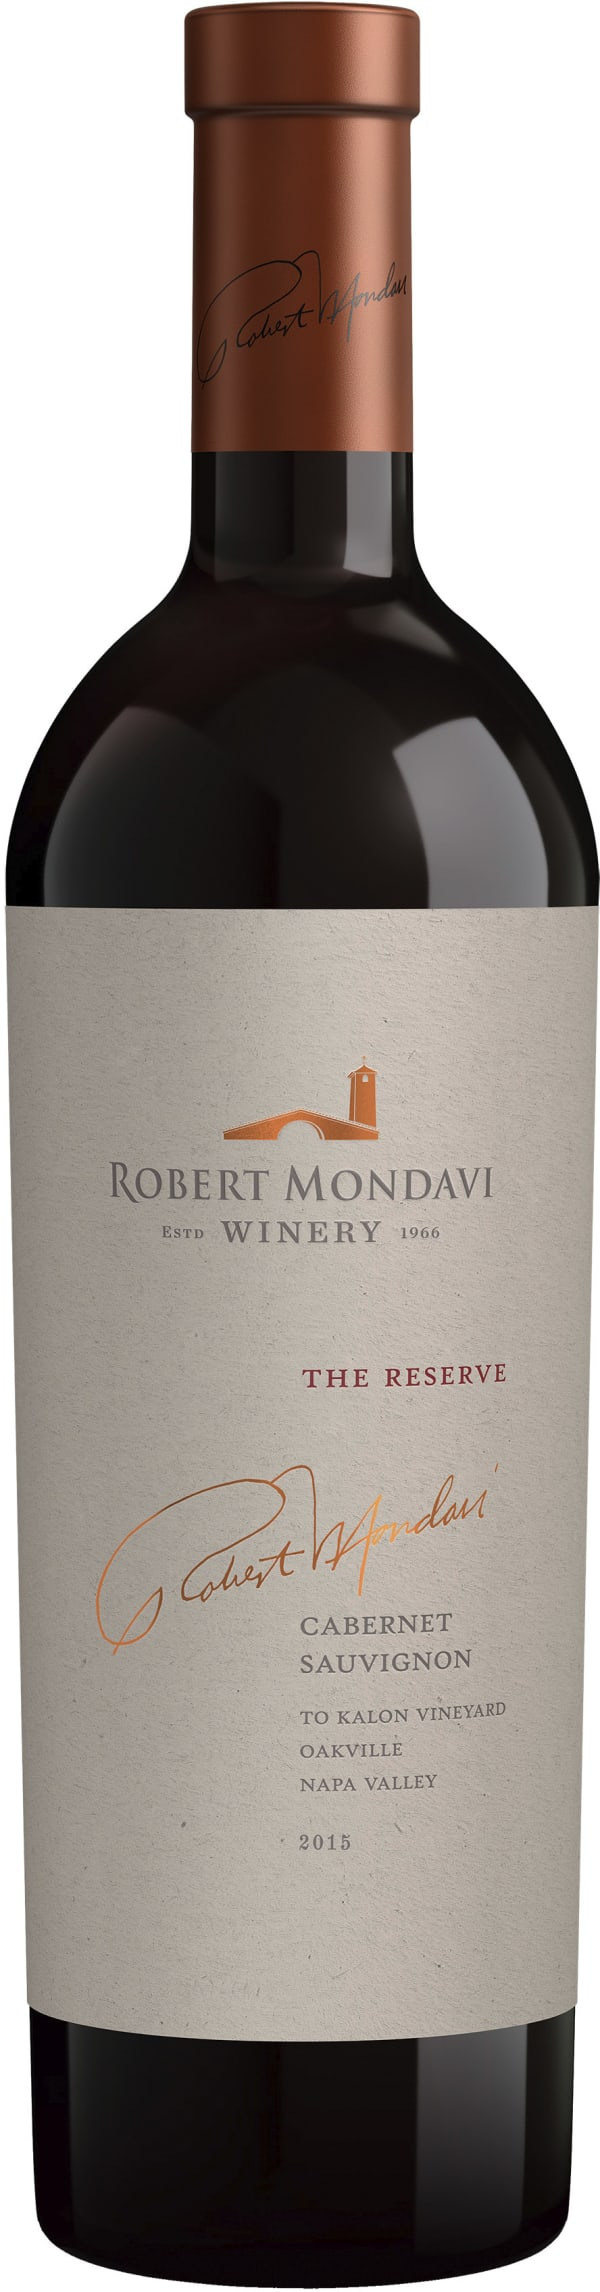 Robert Mondavi The Reserve Cabernet Sauvignon To Kalon Vineyard 2015